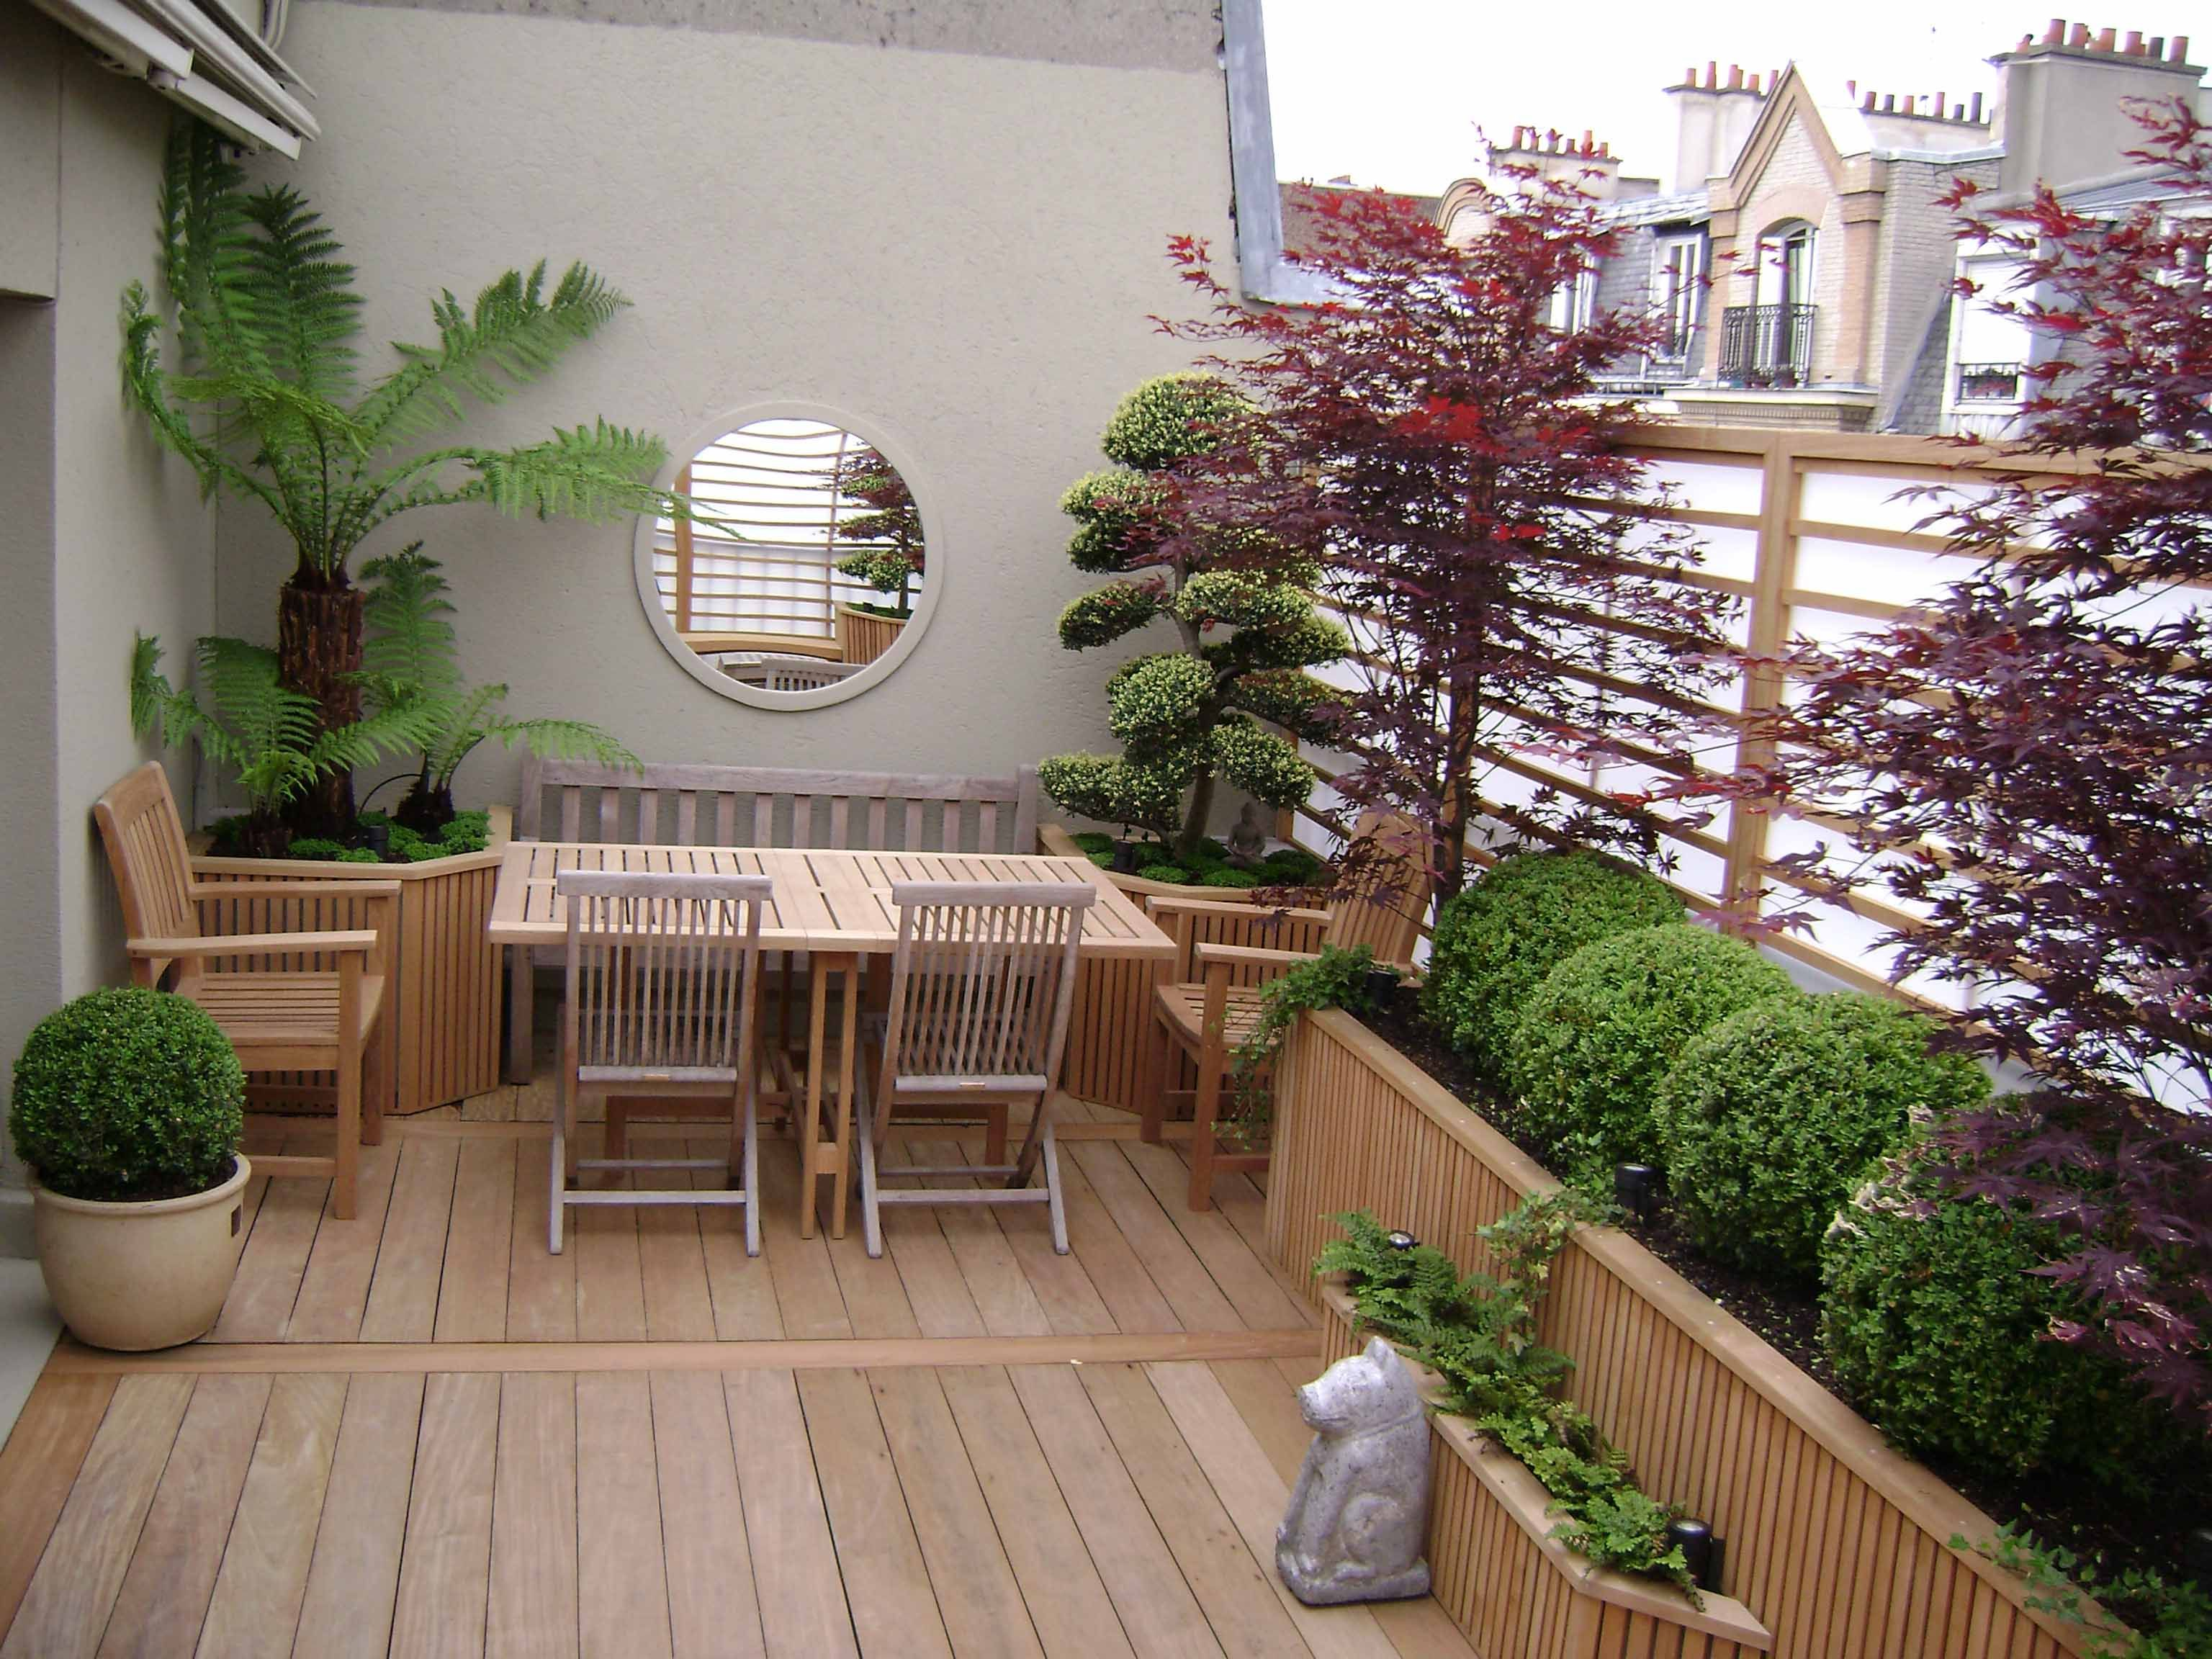 Deco terrasse matelas 2017 - Decoration terrasse balcon ...